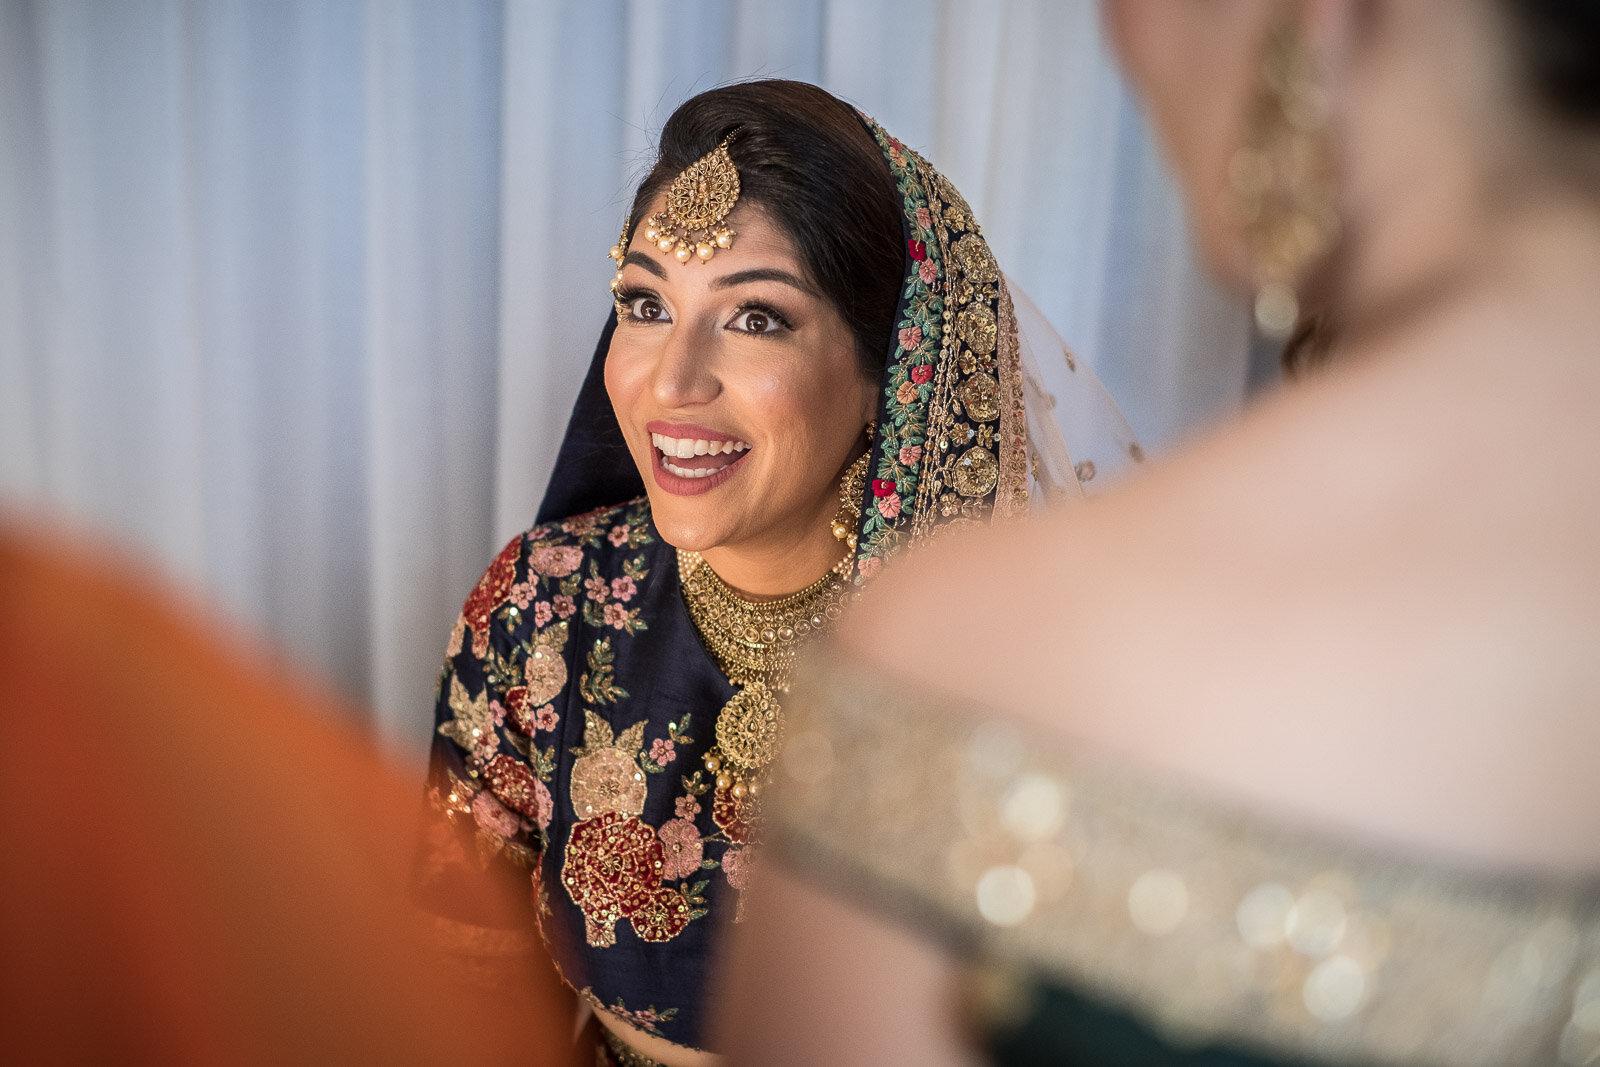 Destination Indian Wedding in Borgo San Faustino 10.jpg